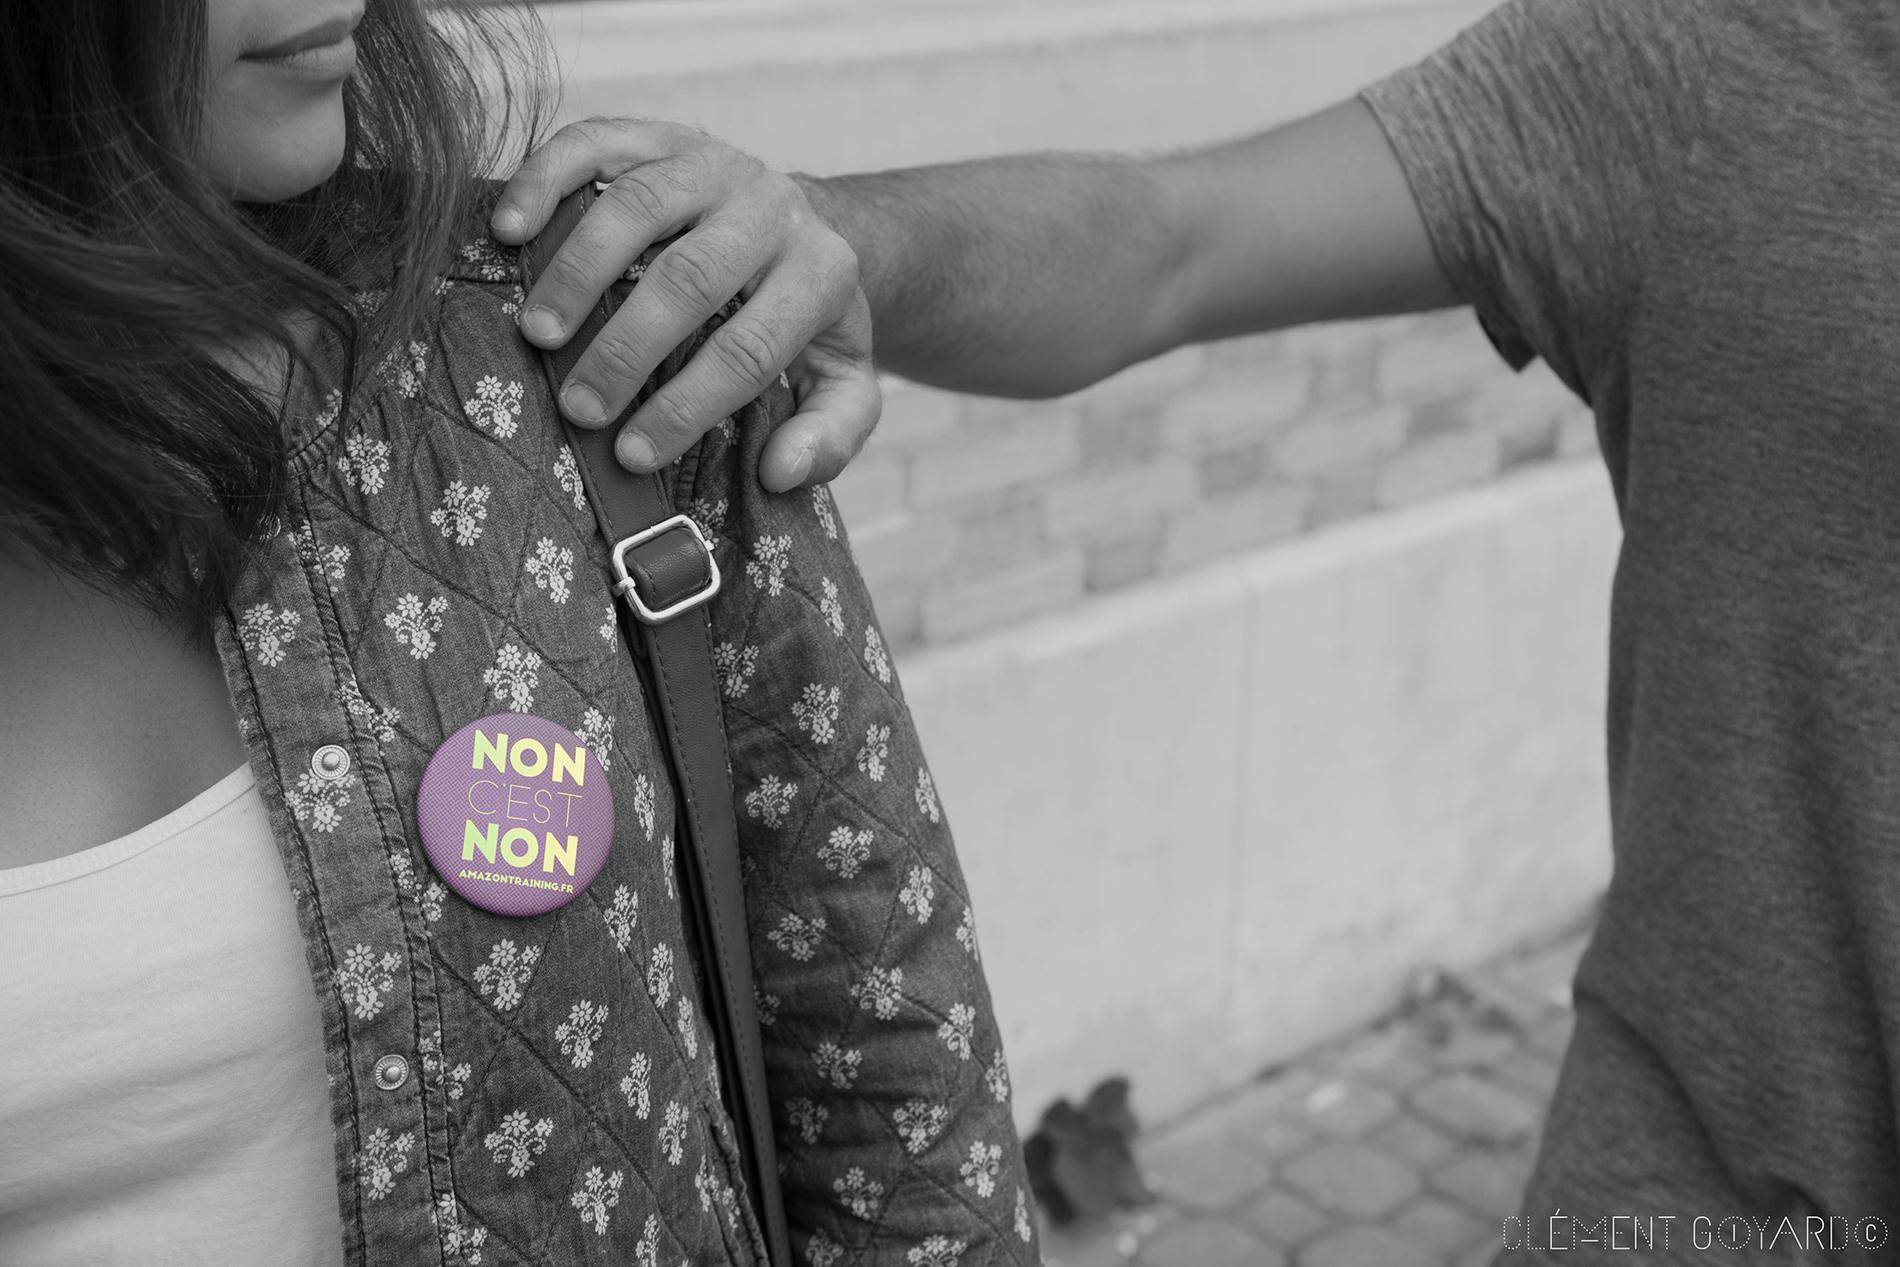 Amazon Training - Non c'est Non - Self Défense Féminine